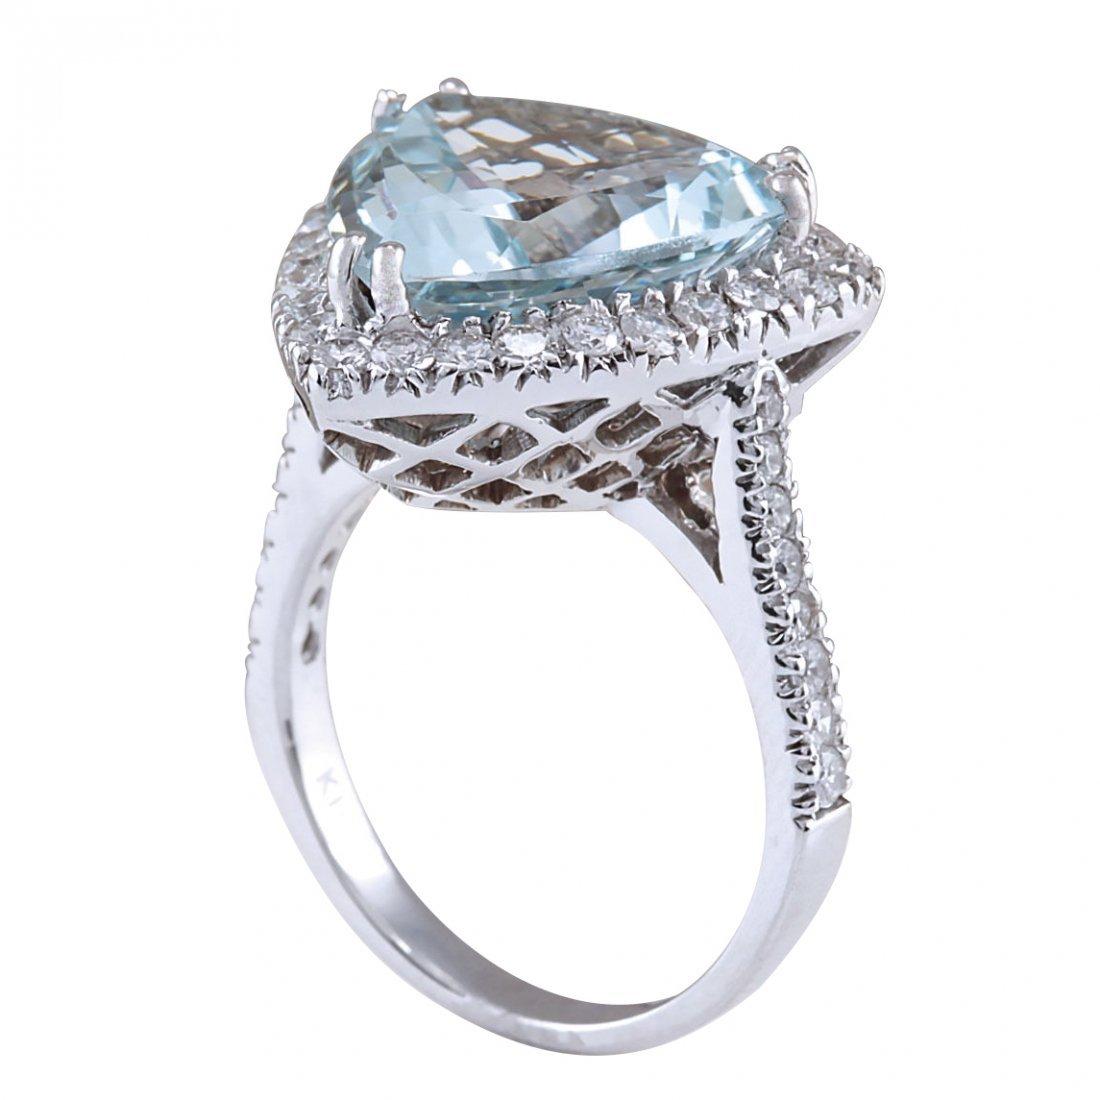 7.75CTW Natural Aquamarine And Diamond Ring In 14K - 3